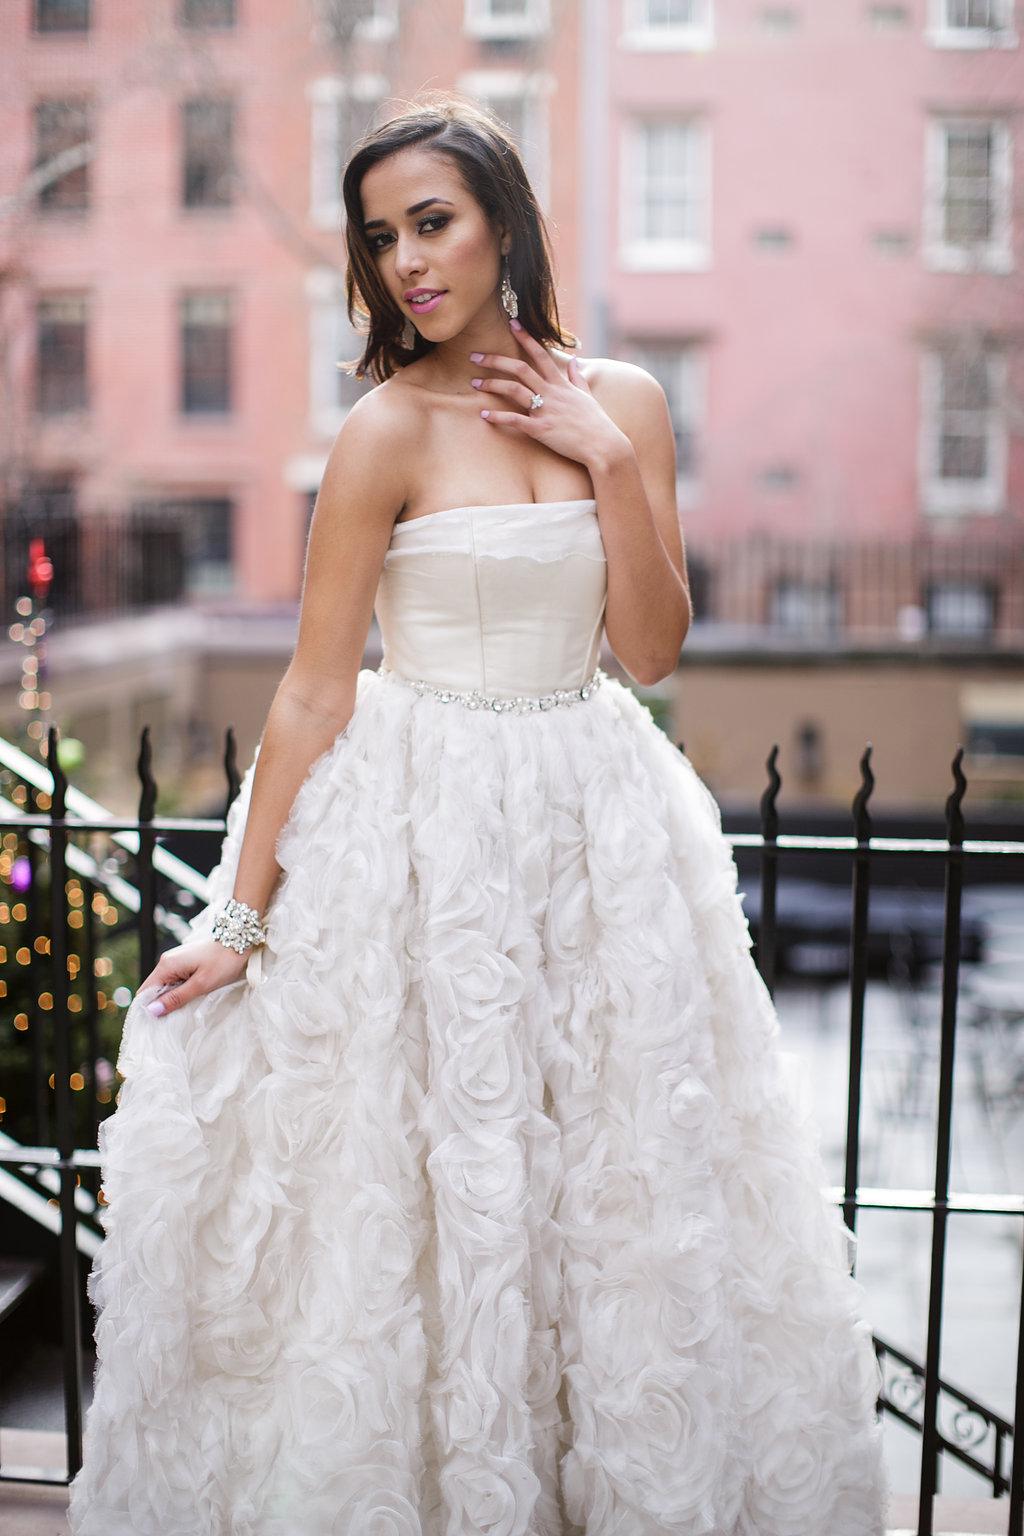 NYC_Highline_Hotel_Bridal_Shoot_PetronellaPhotography-64.jpg